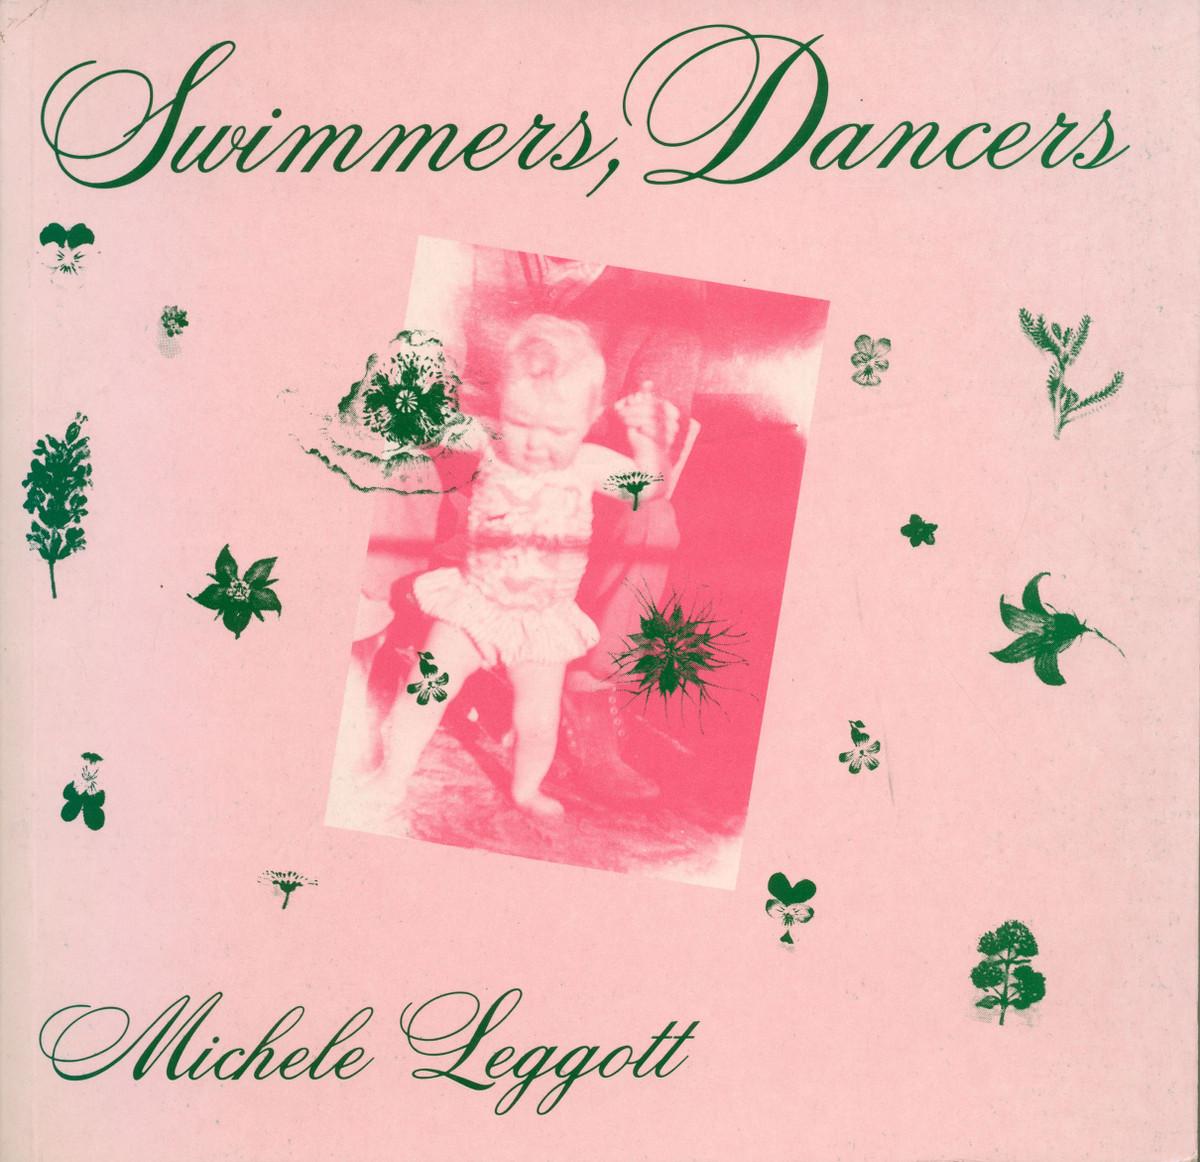 Swimmers, Dancers by Michele Leggott